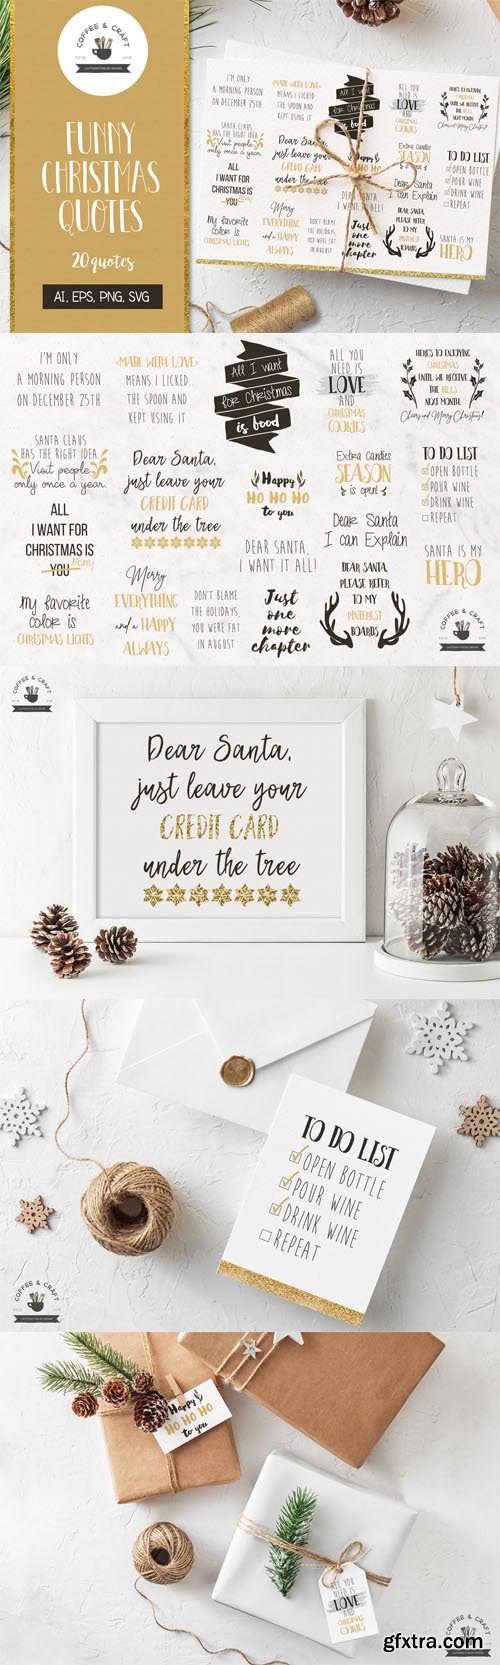 Designbundles - 20 Funny Christmas Quotes